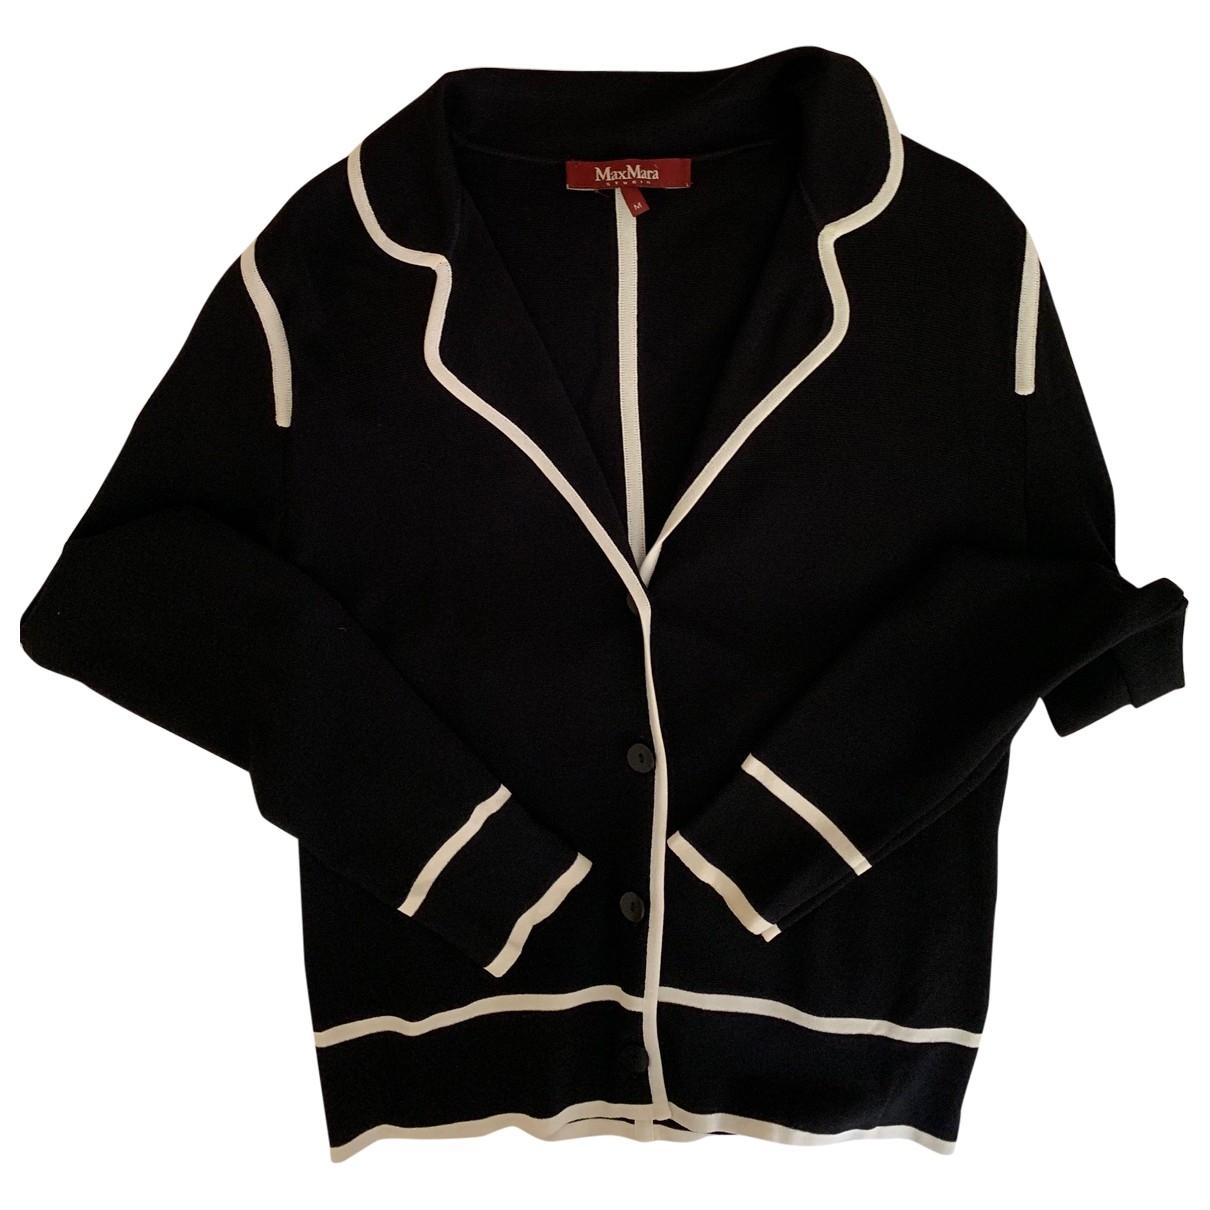 Max Mara Studio \N Black jacket for Women M International